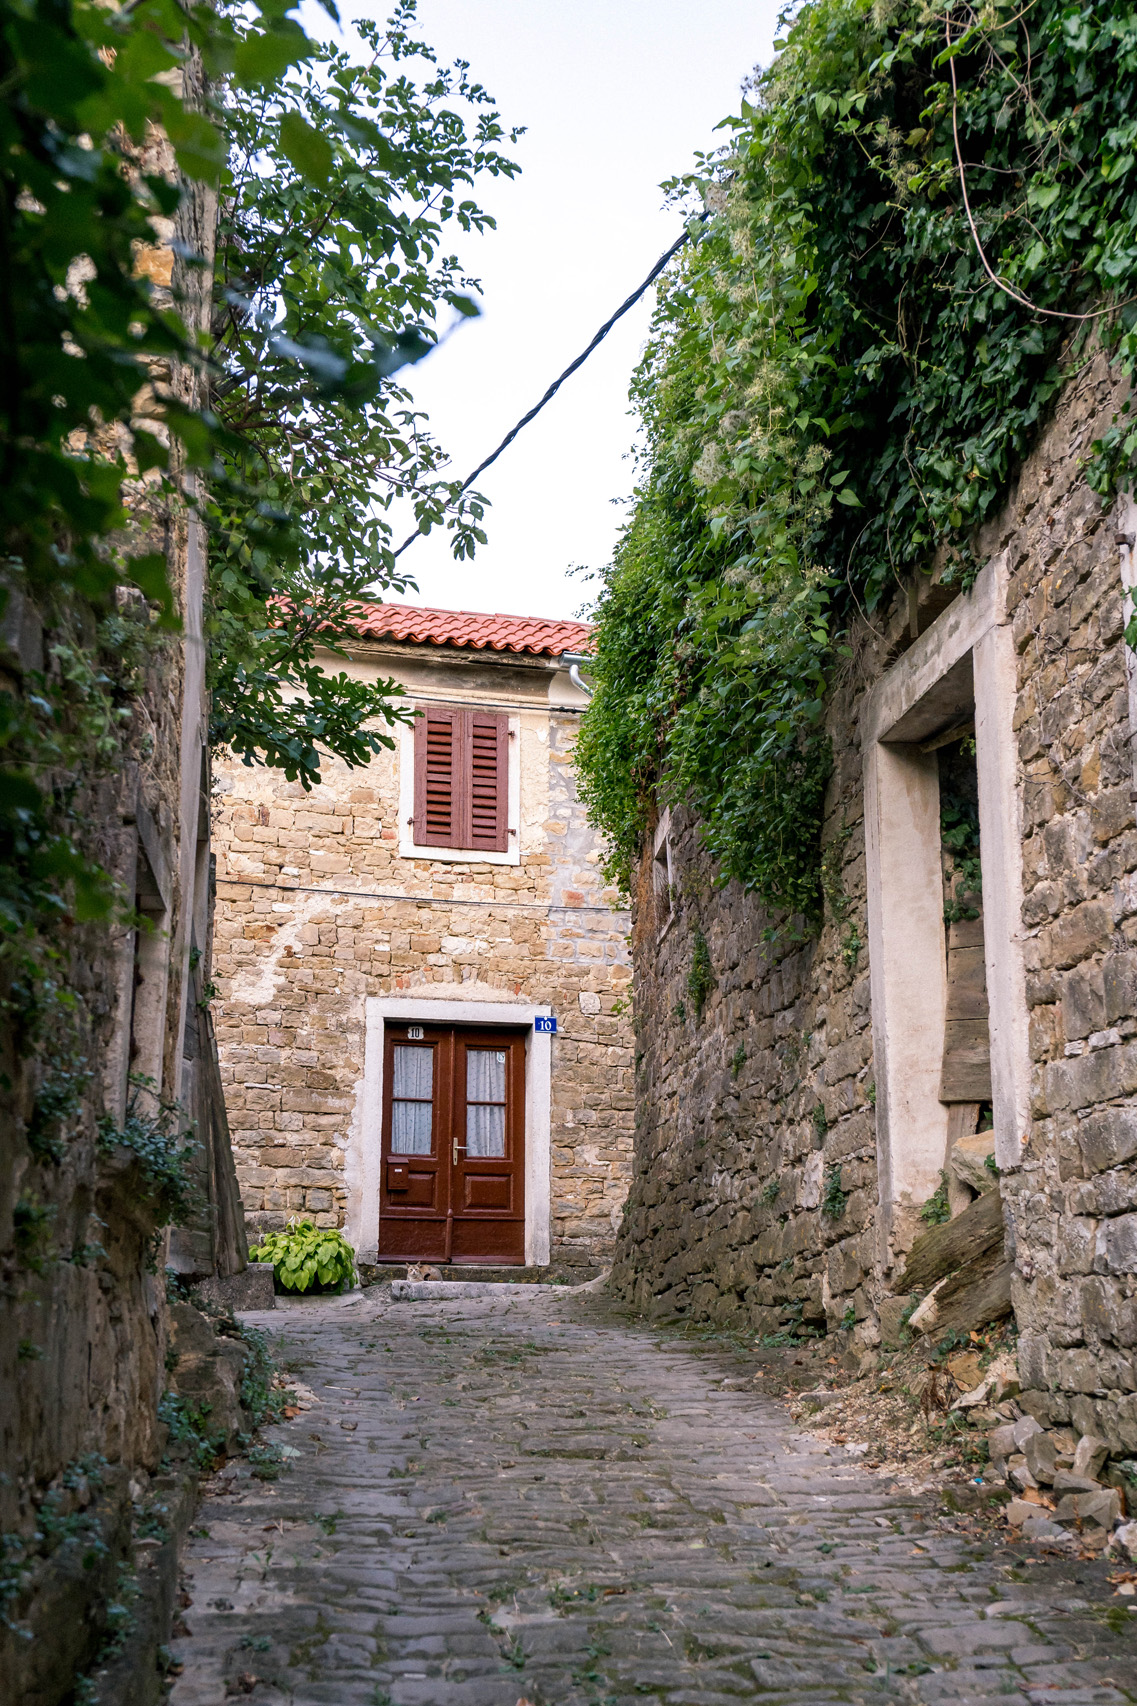 The streets of Zavrsje, Istria